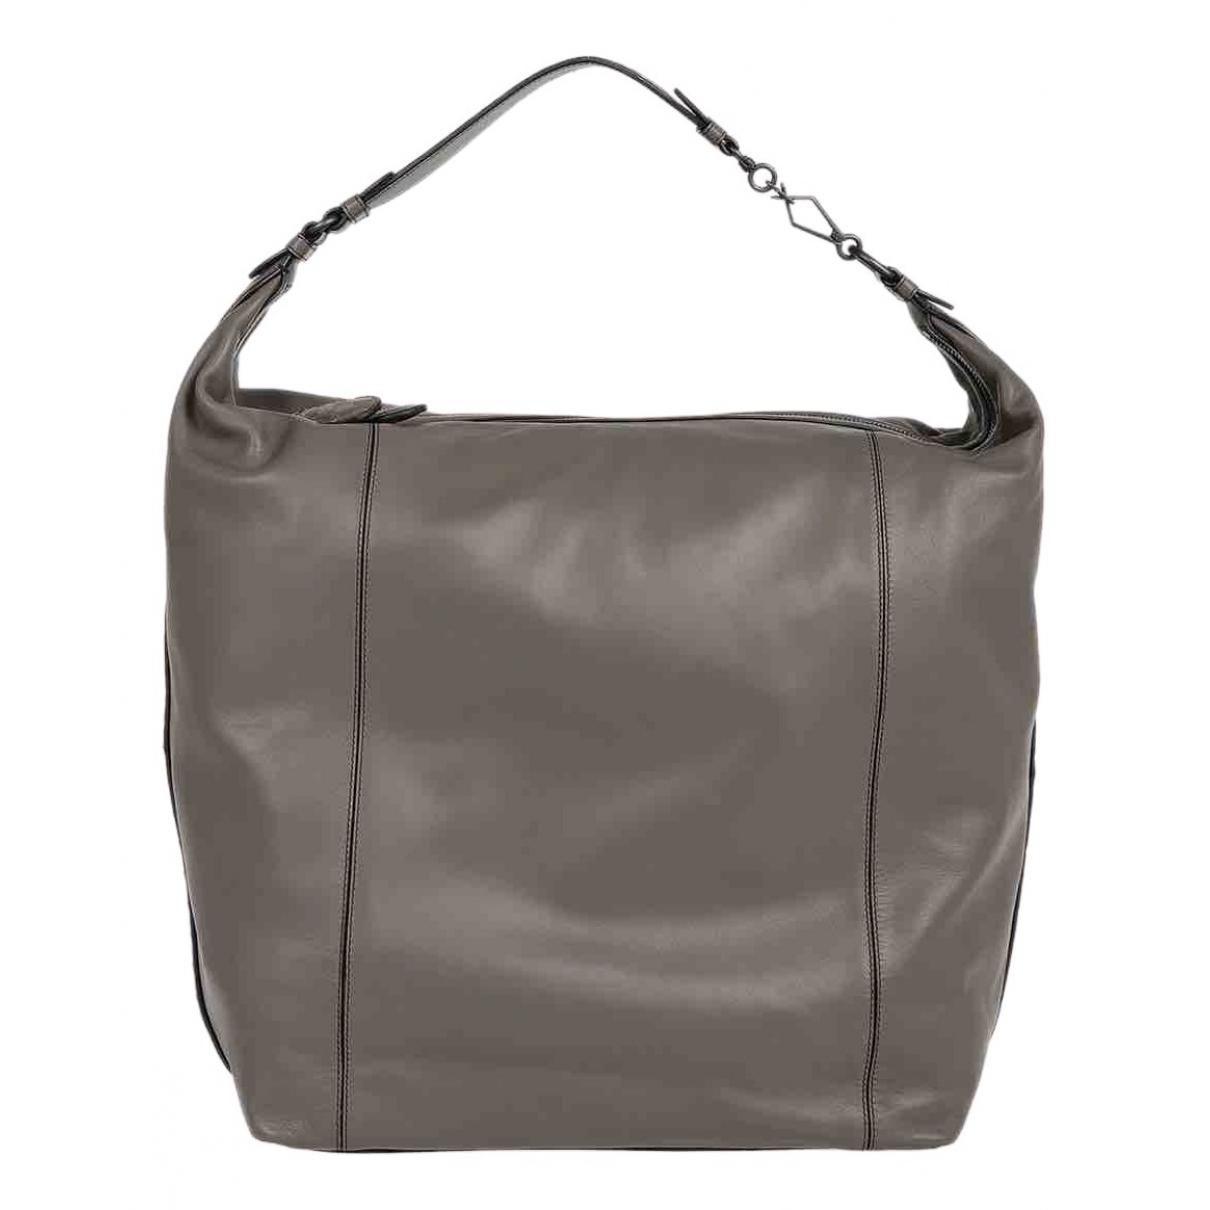 Bottega Veneta N Grey Leather handbag for Women N